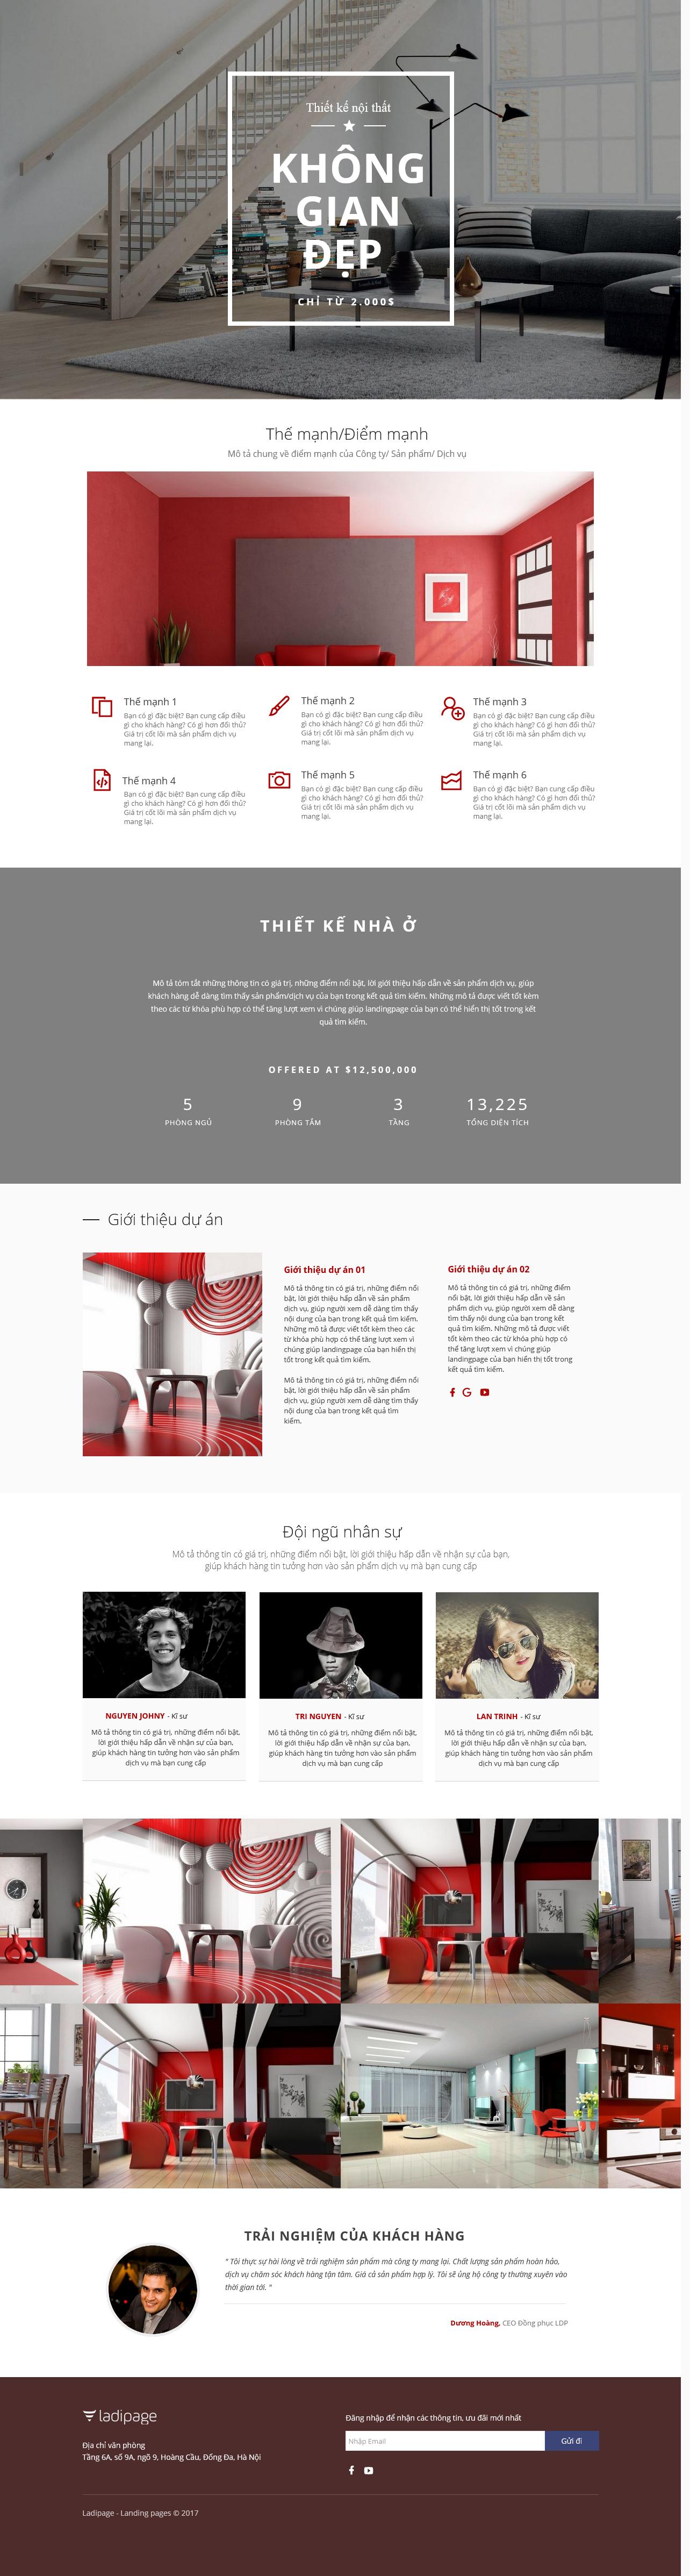 Thiết kế website Thiết kế webiste landingpage noi-that---ngoai-that Nội thất 08